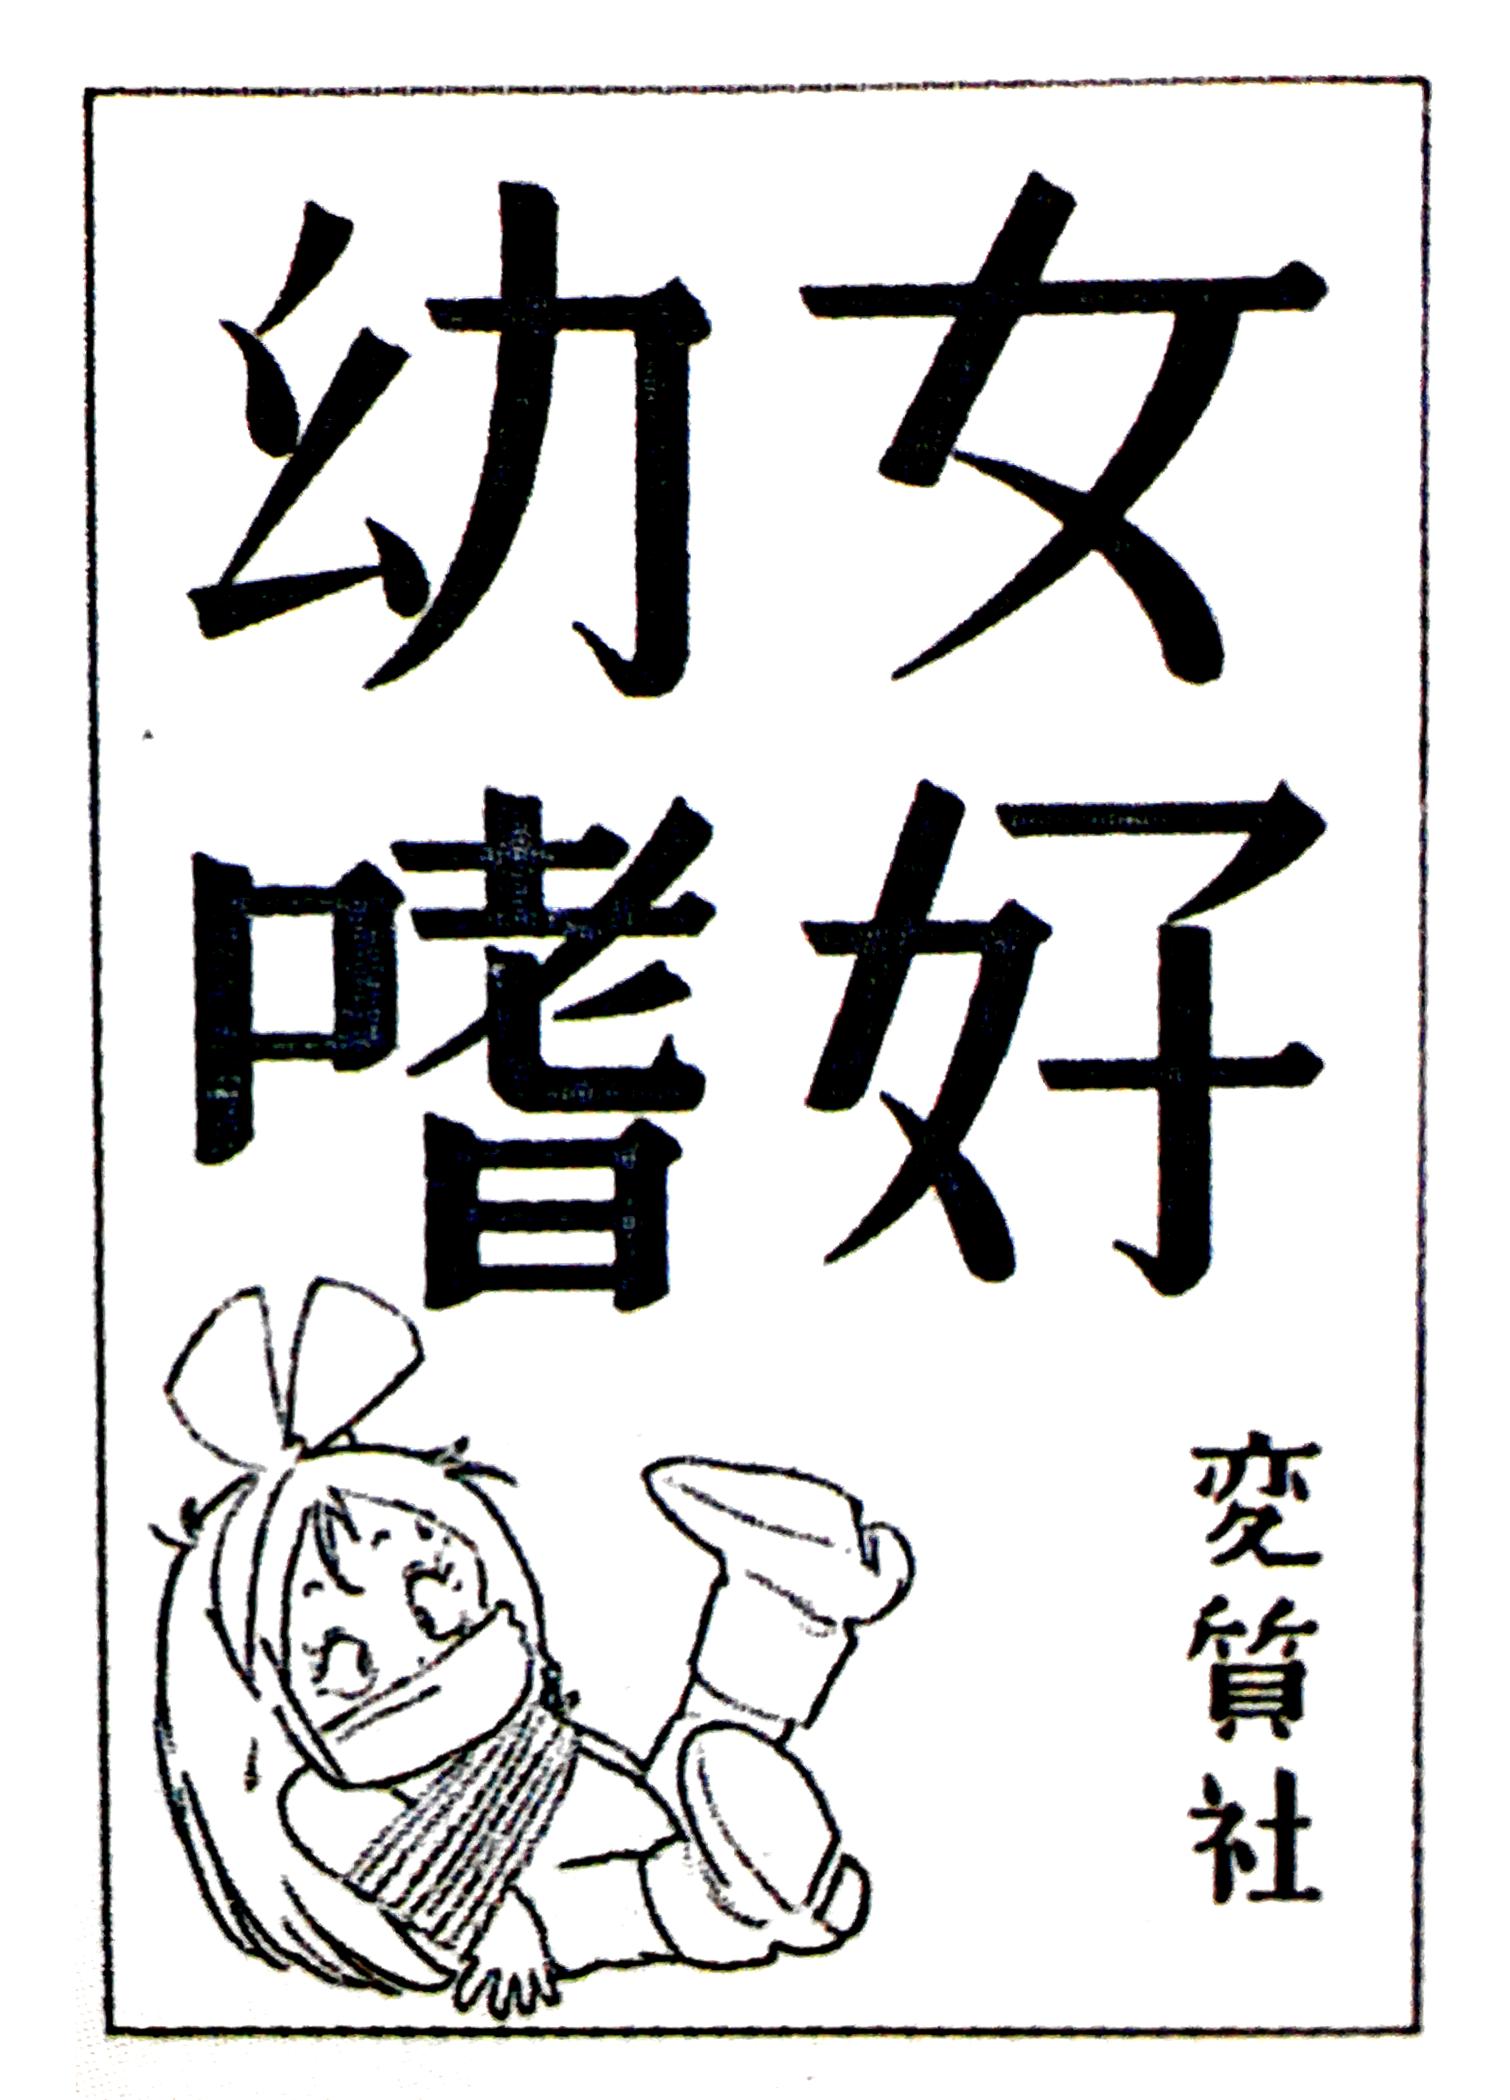 f:id:kougasetumei:20200123184027p:image:w300